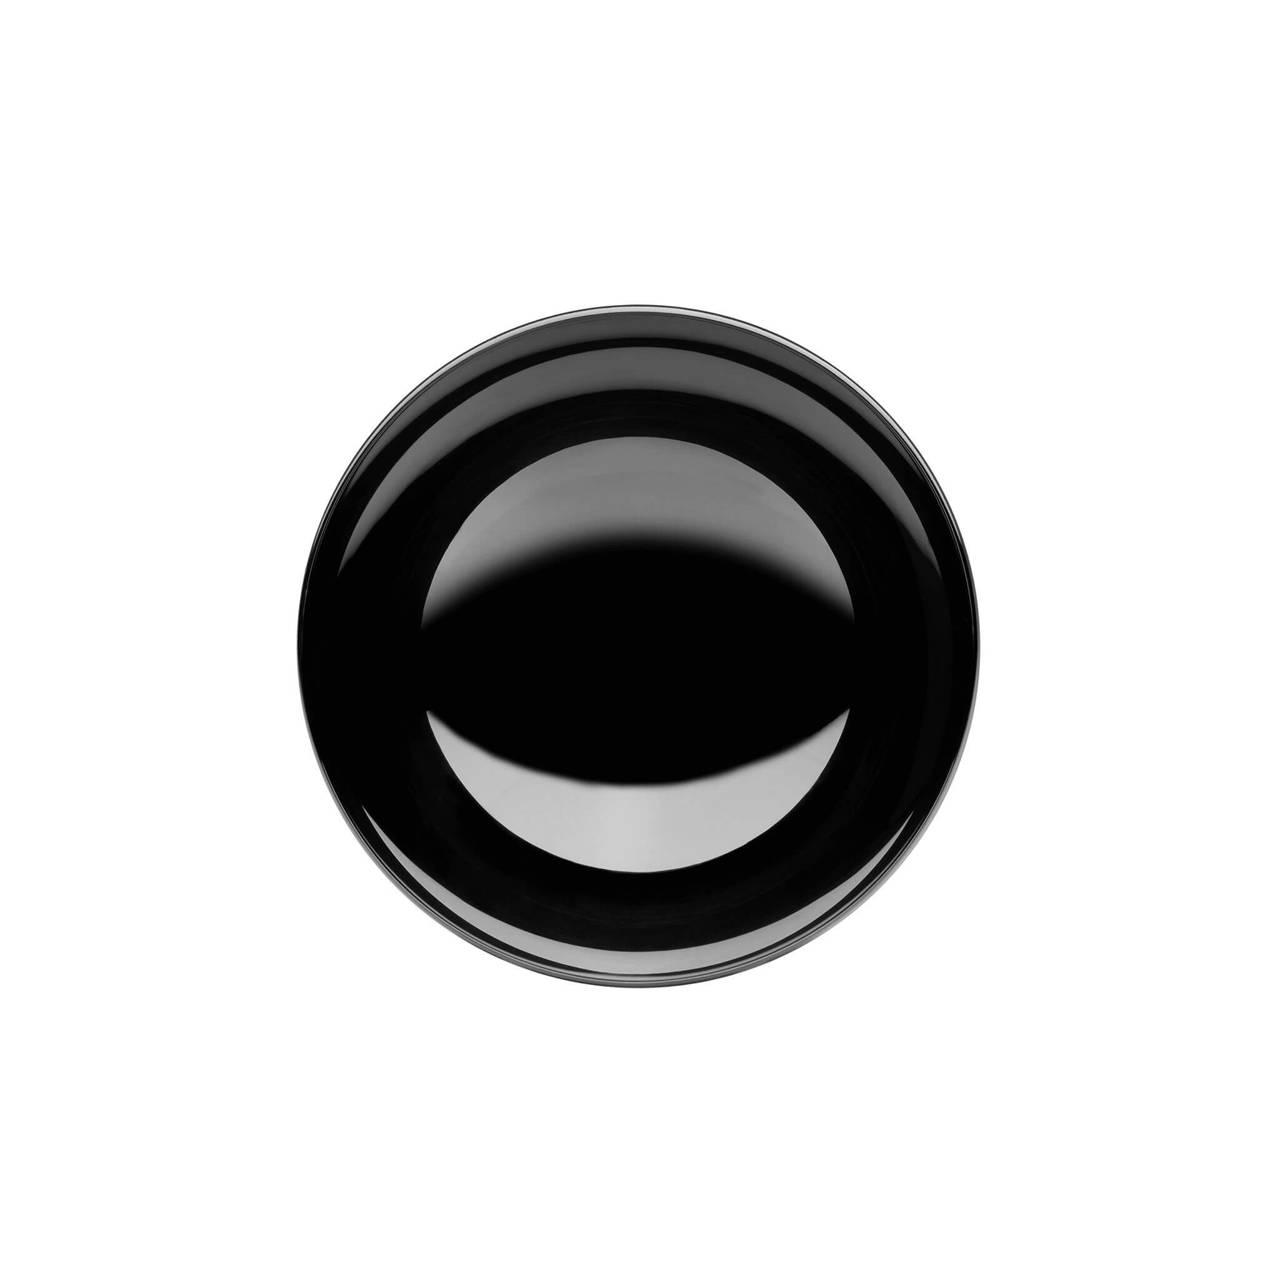 Dish 60 in Black Nickel top view